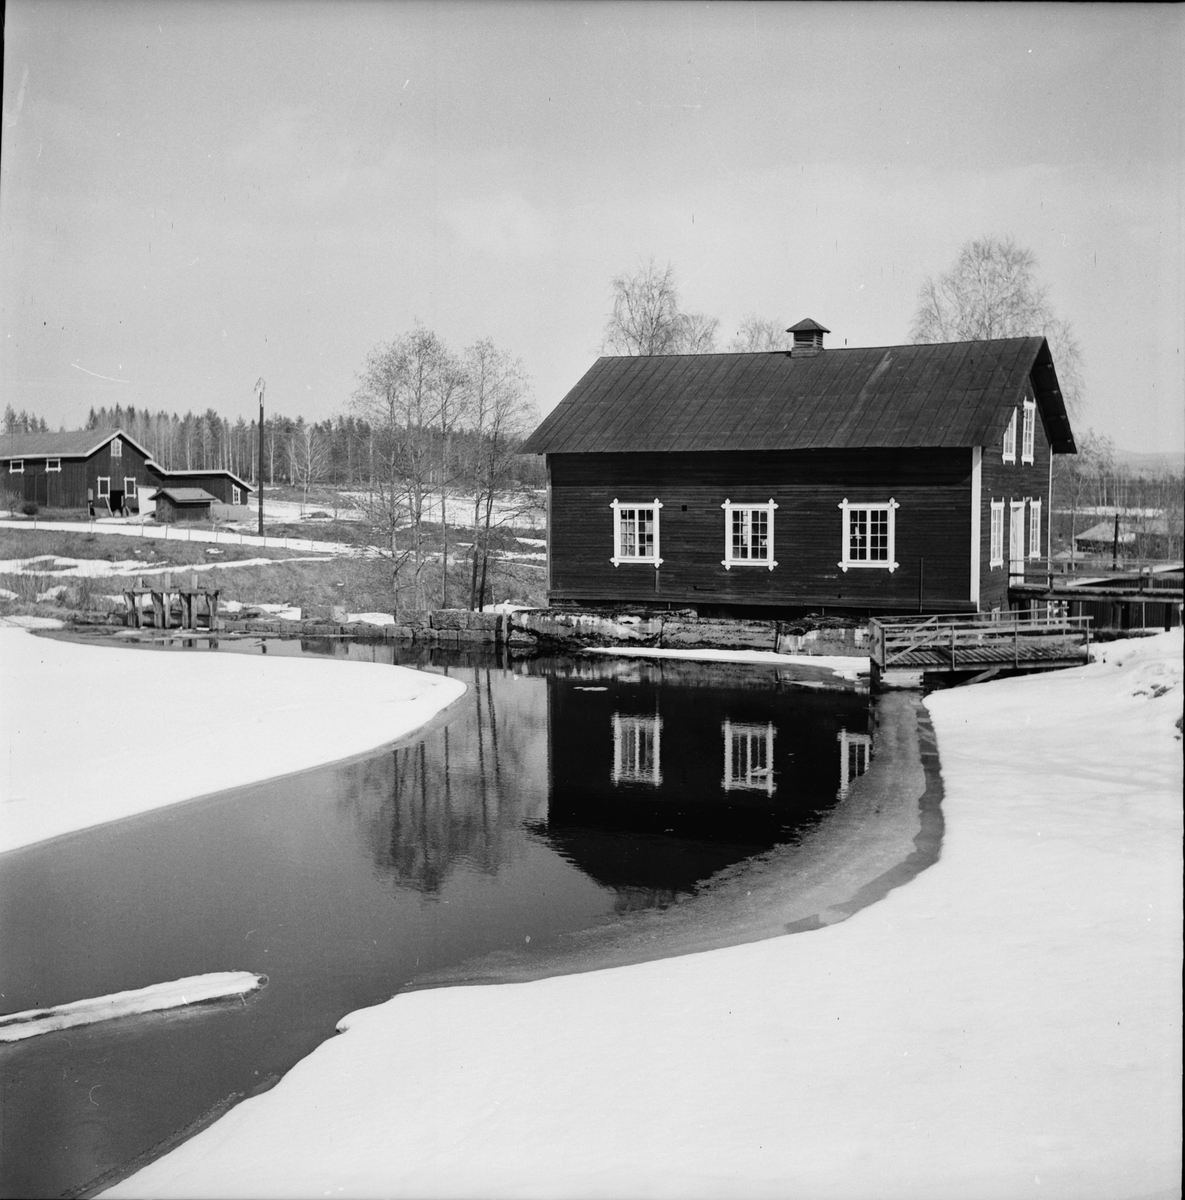 Simeå, Bilder fr samhället, April 1972